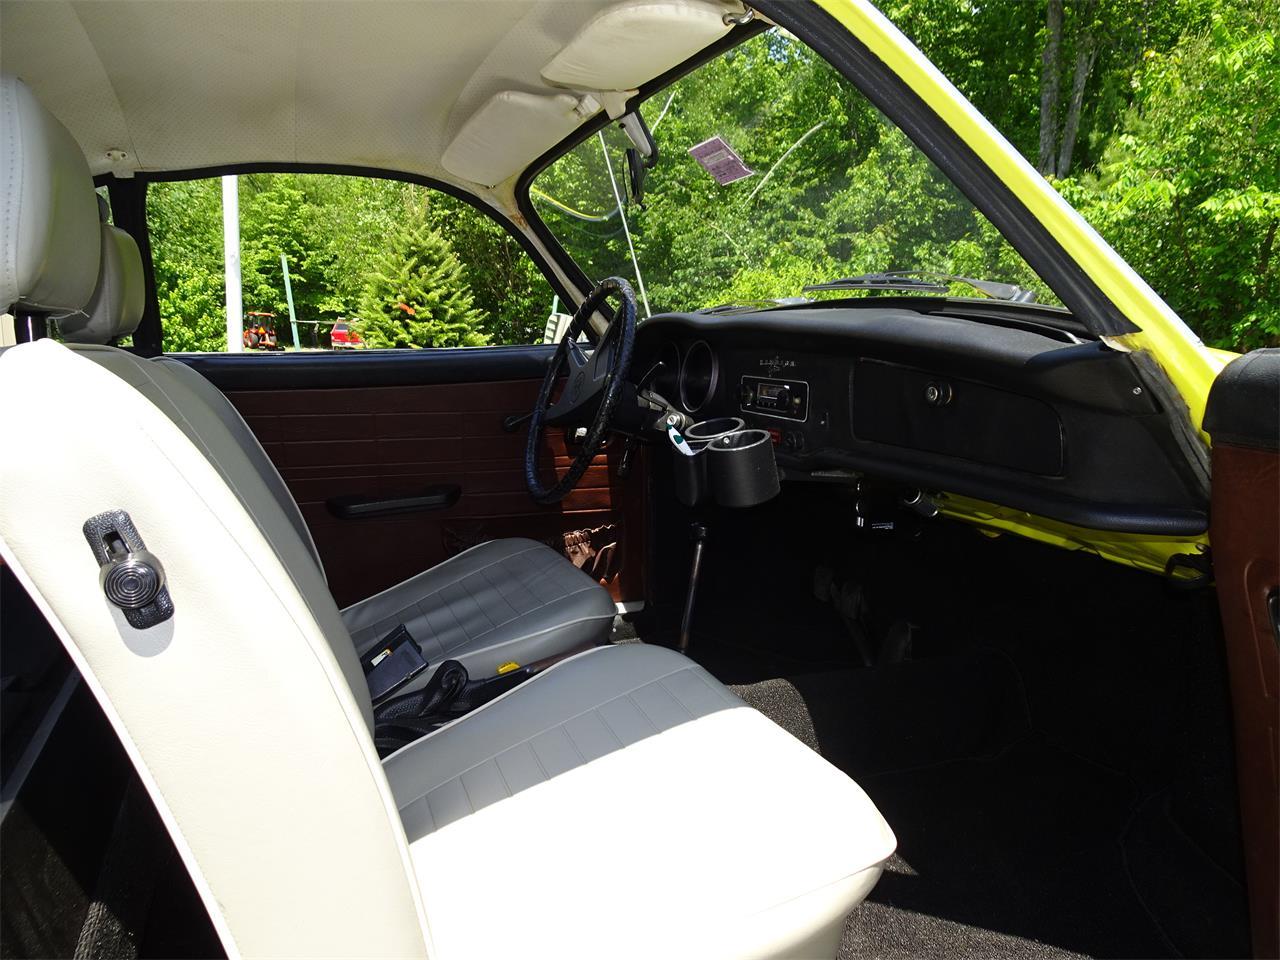 1974 Volkswagen Karmann Ghia (CC-1355197) for sale in Eliot, Maine